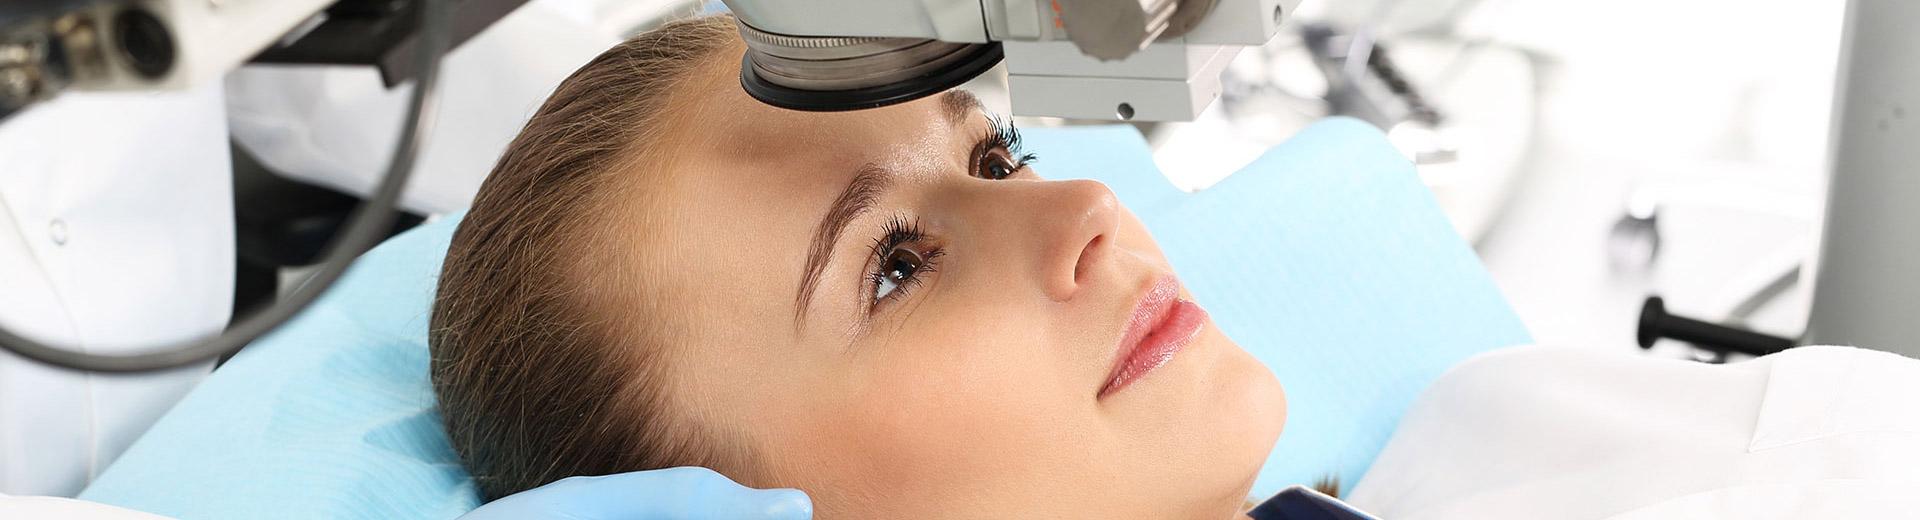 alternative vision correction options for lasik